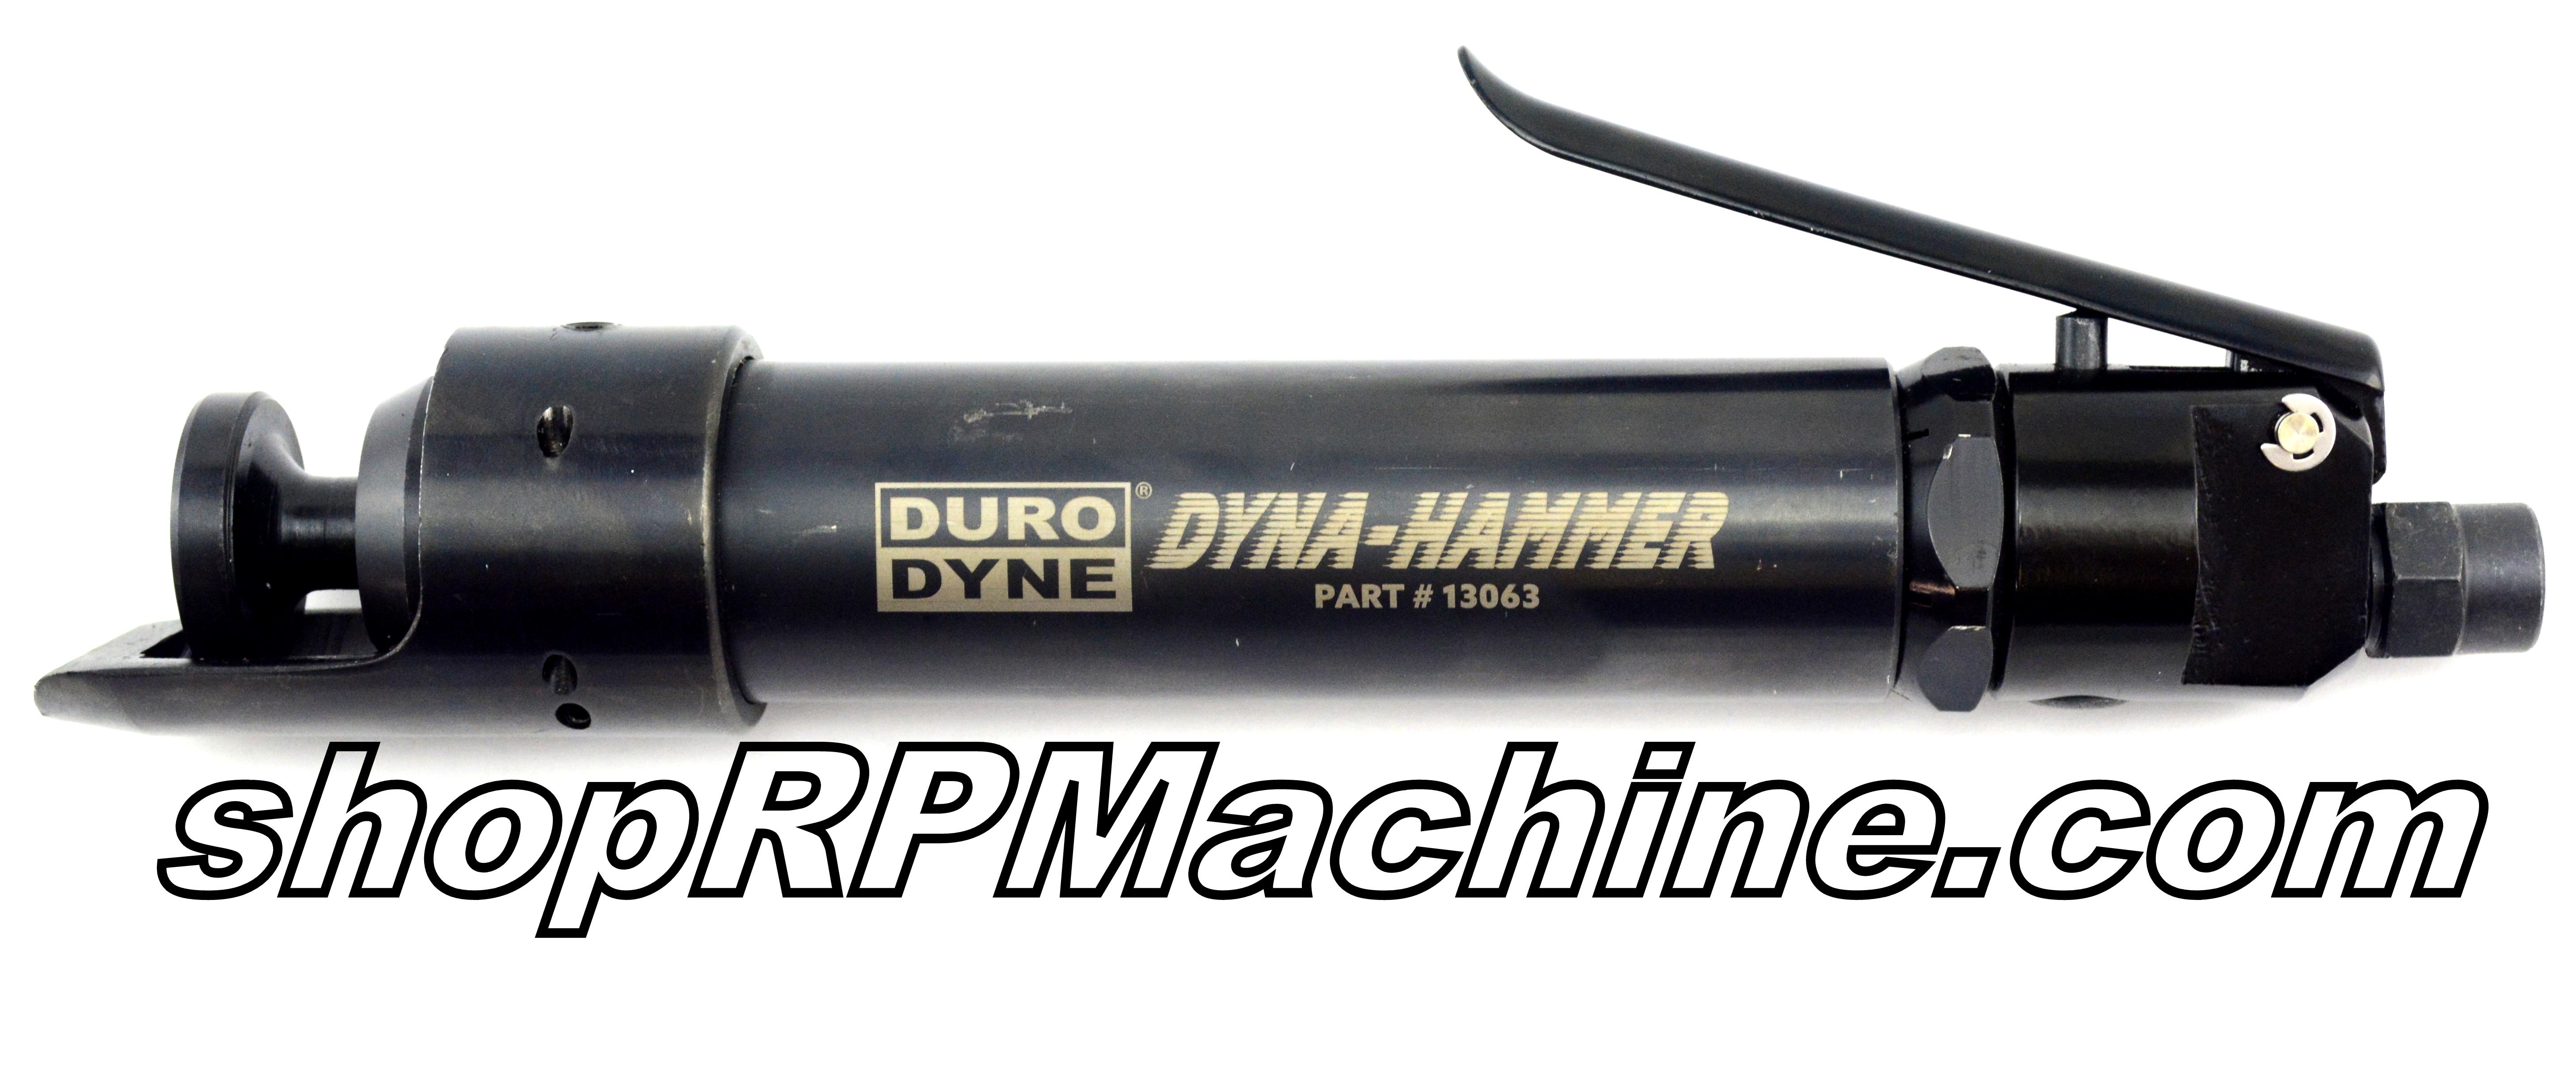 dyna-hammer.jpg